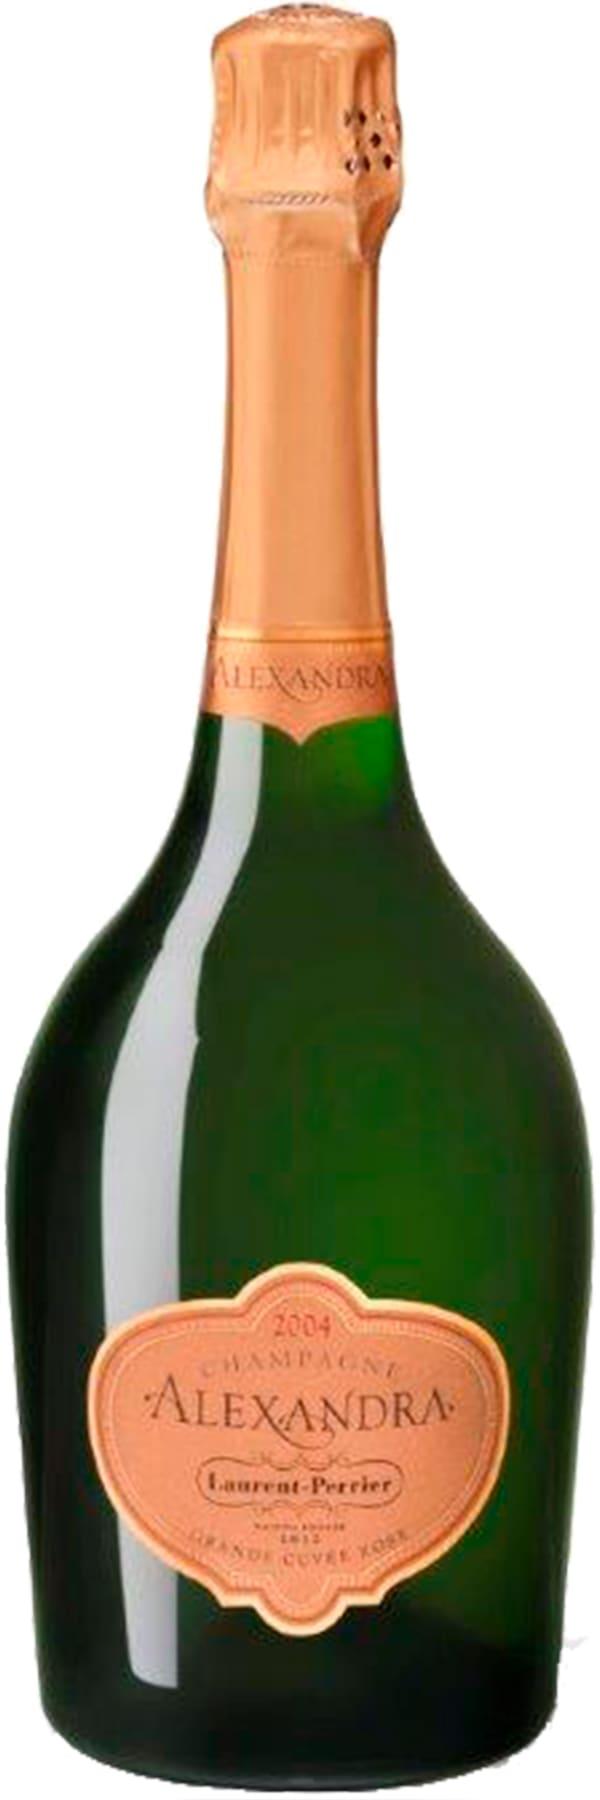 Laurent-Perrier Alexandra Grande Cuvée Rosé 2004